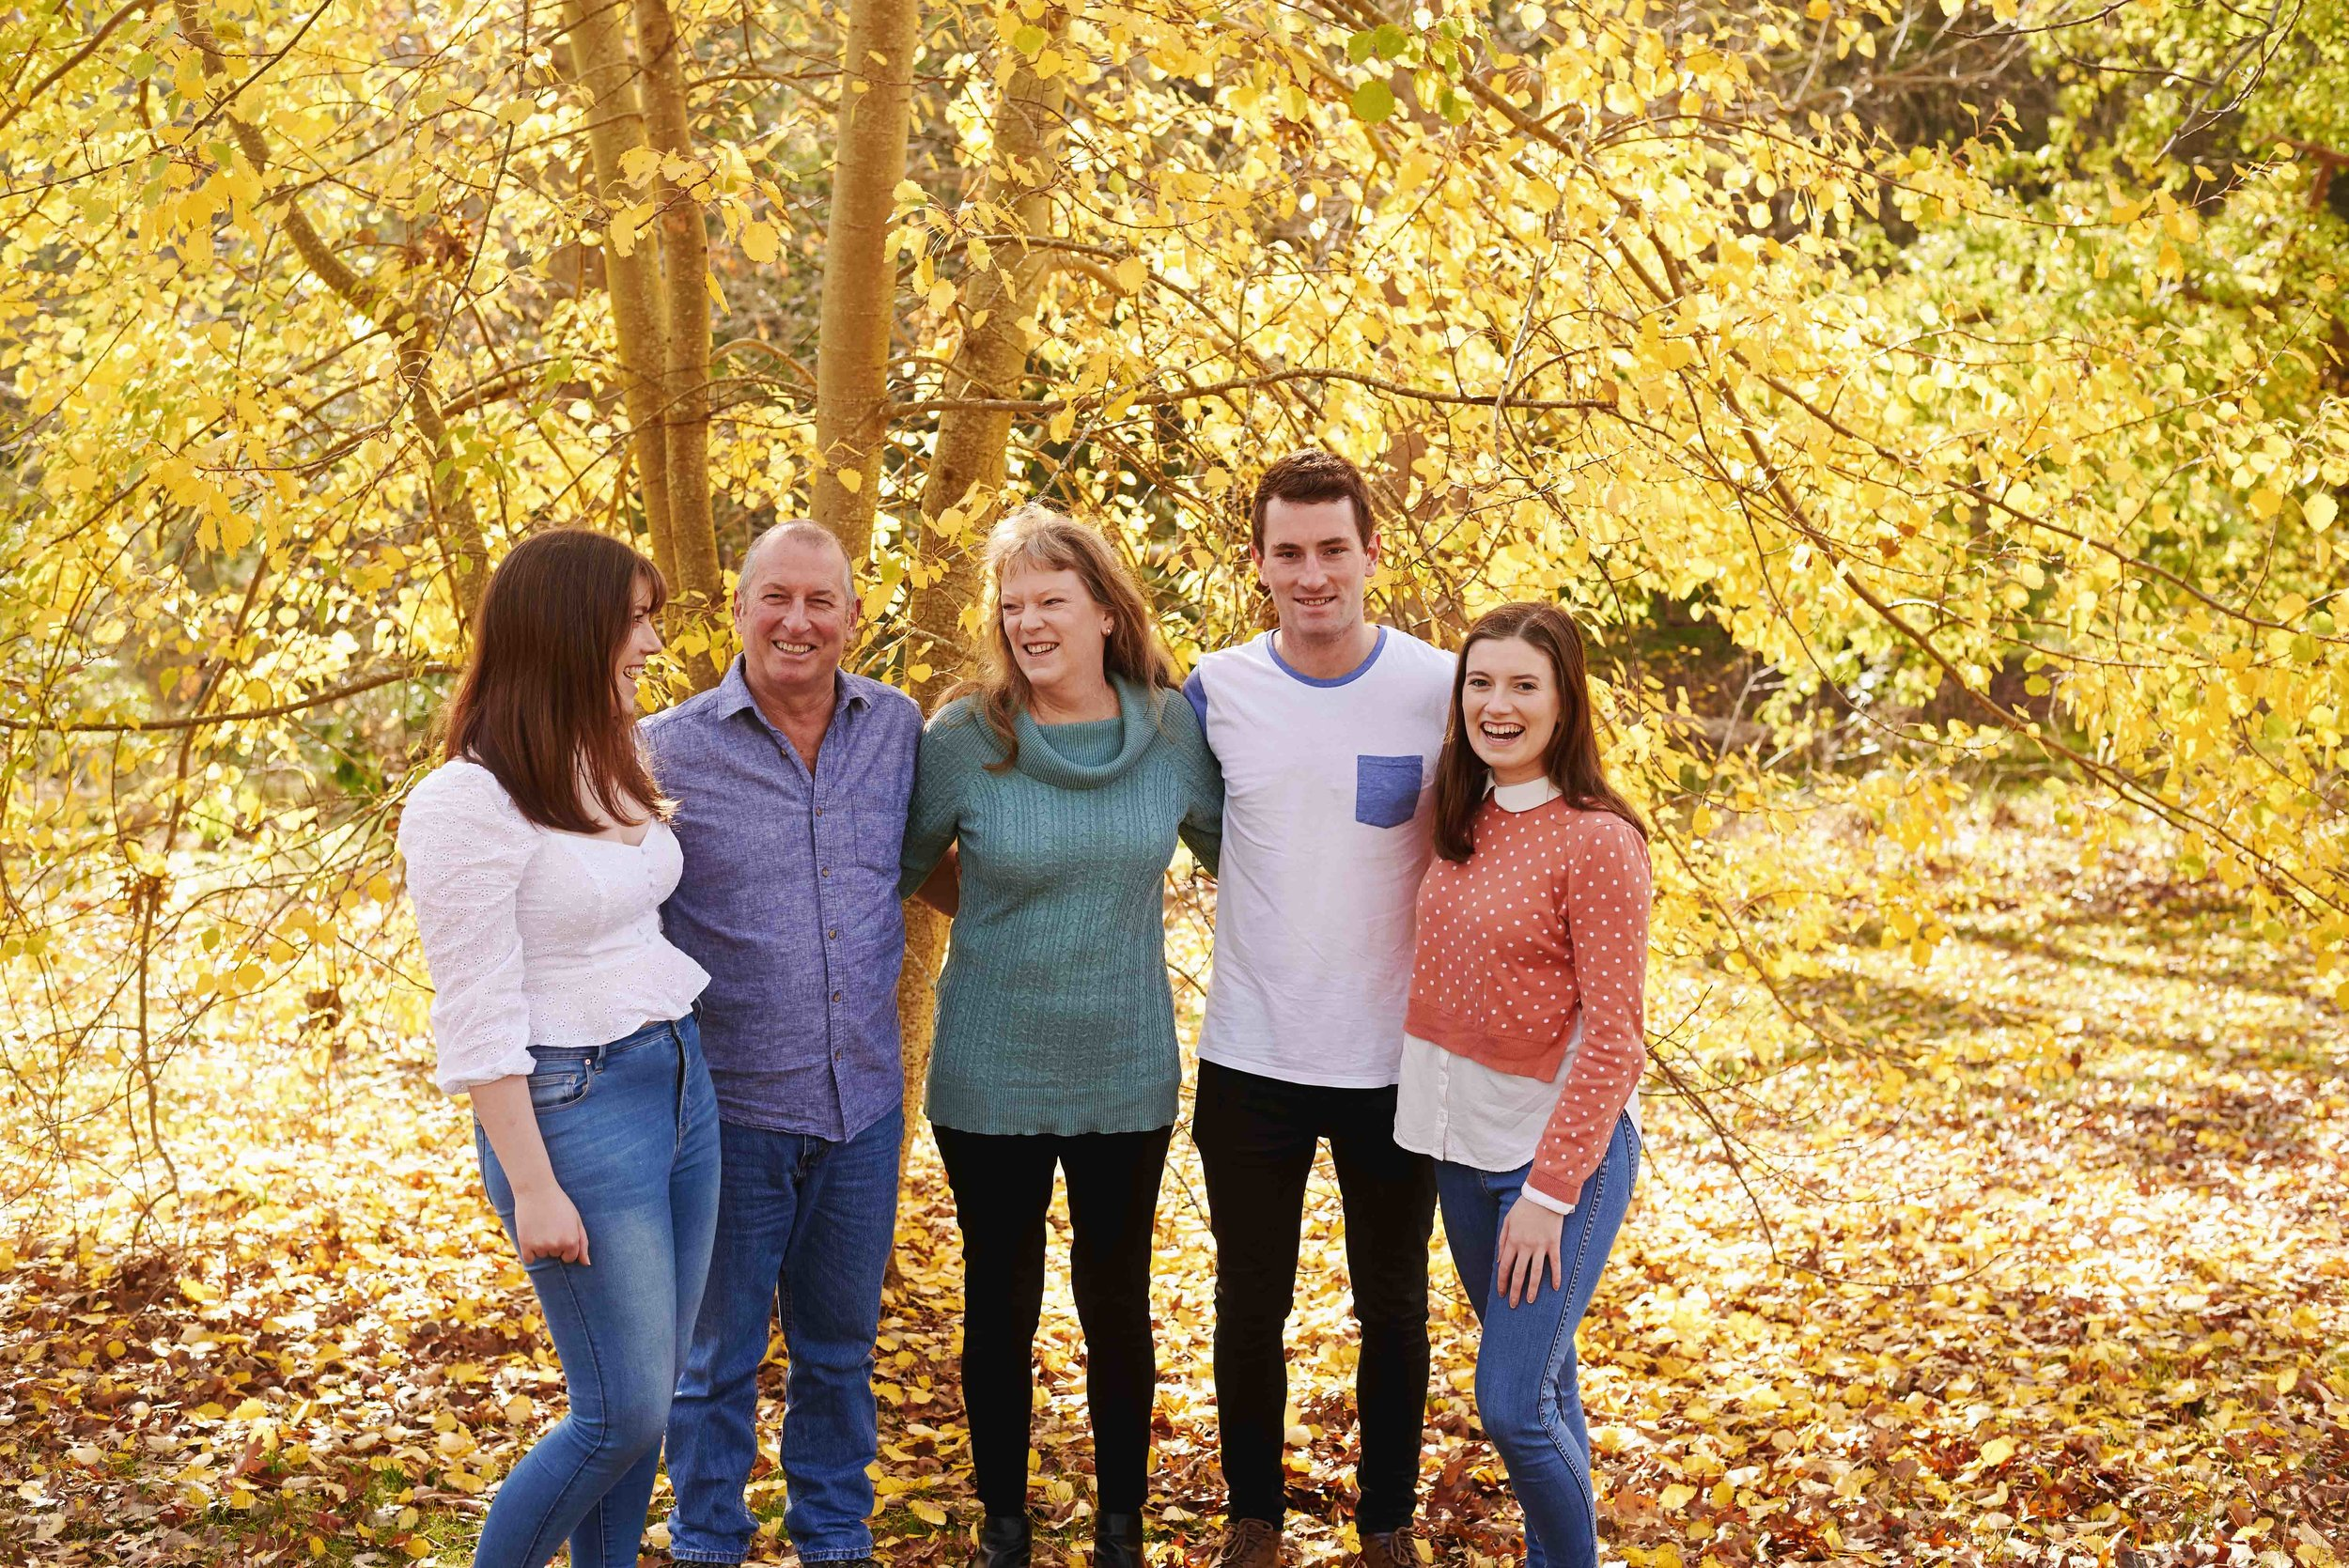 mornington-peninsula-family-photographer-marissa-jade-photography-families-red-hill-6.jpg